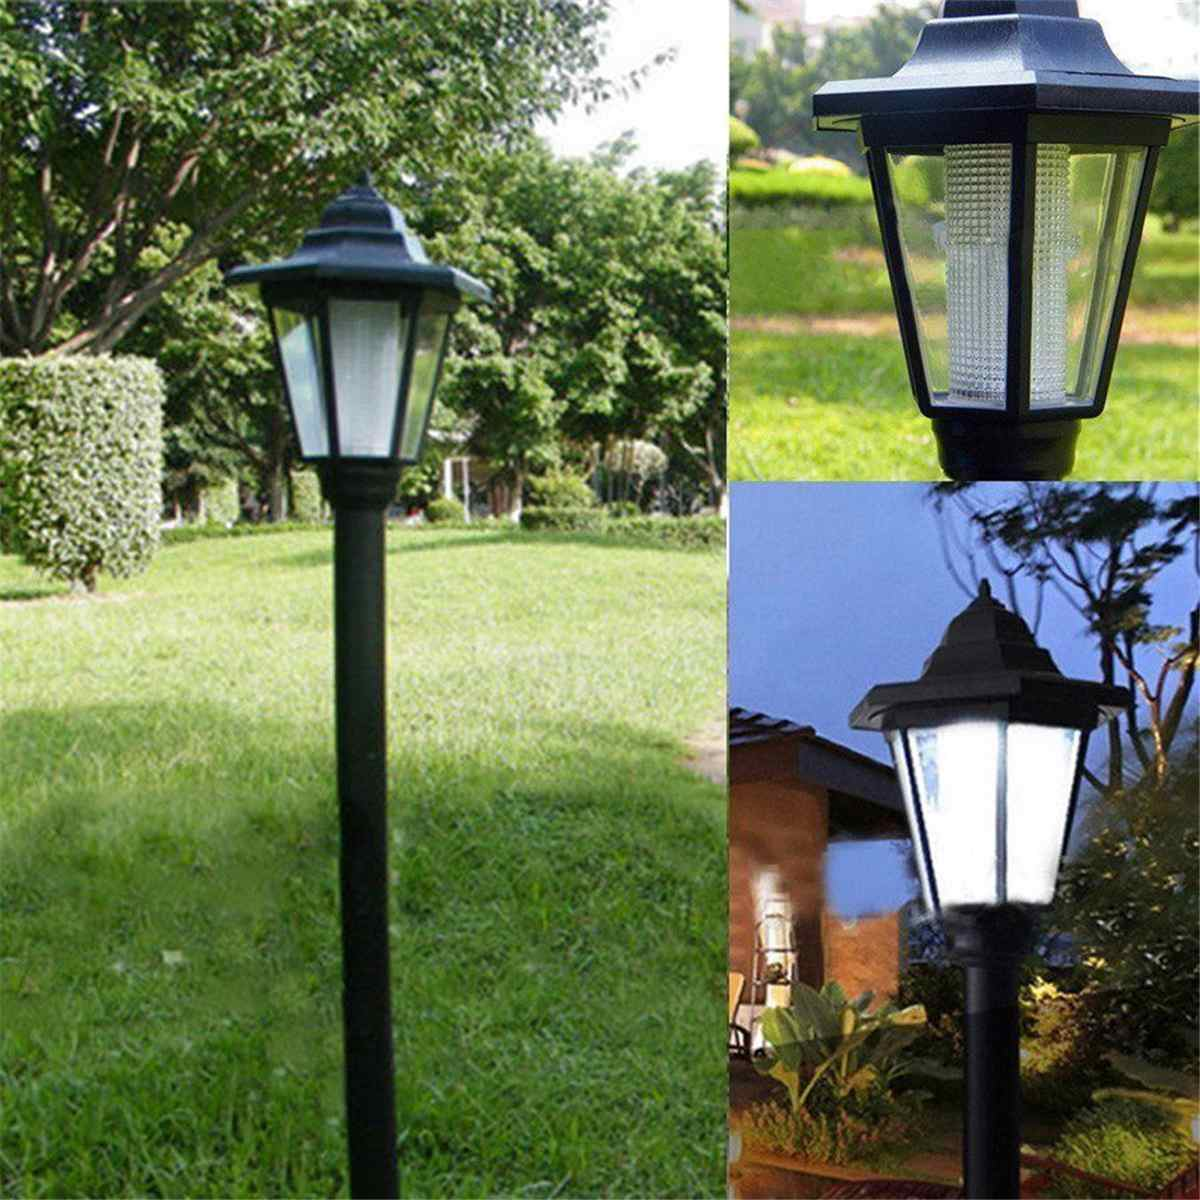 Garden Lanterns Pillar Yard Garden Decoration Lighting White Light LED Solar Light Under Ground Lawn Lamp Post Outdoor